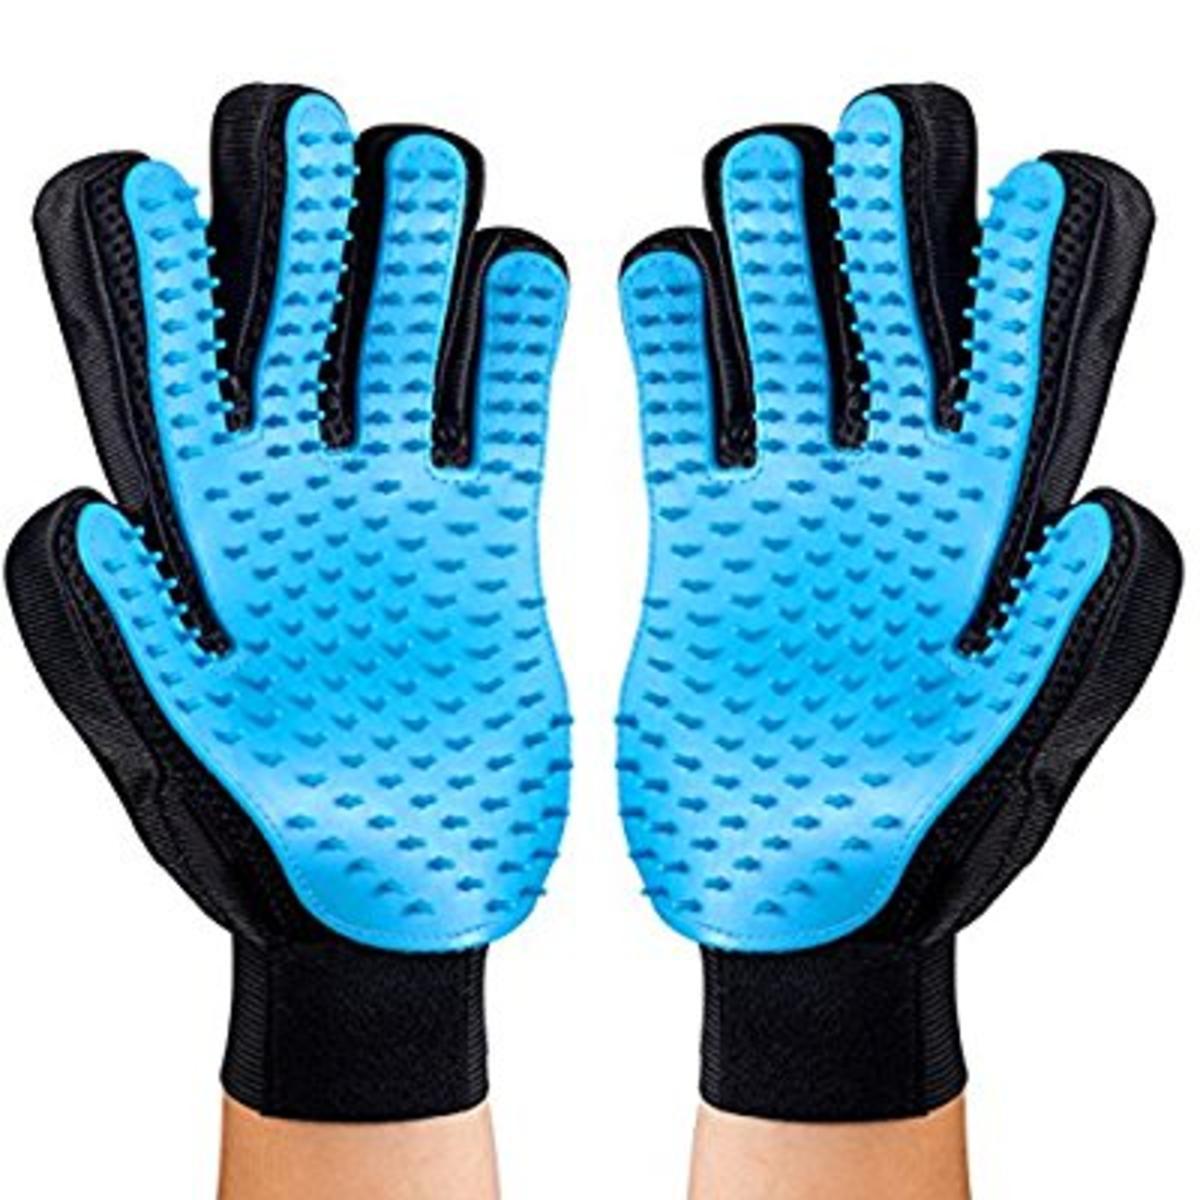 2PCS Pet Bürste Handschuh【Aufgerüstete